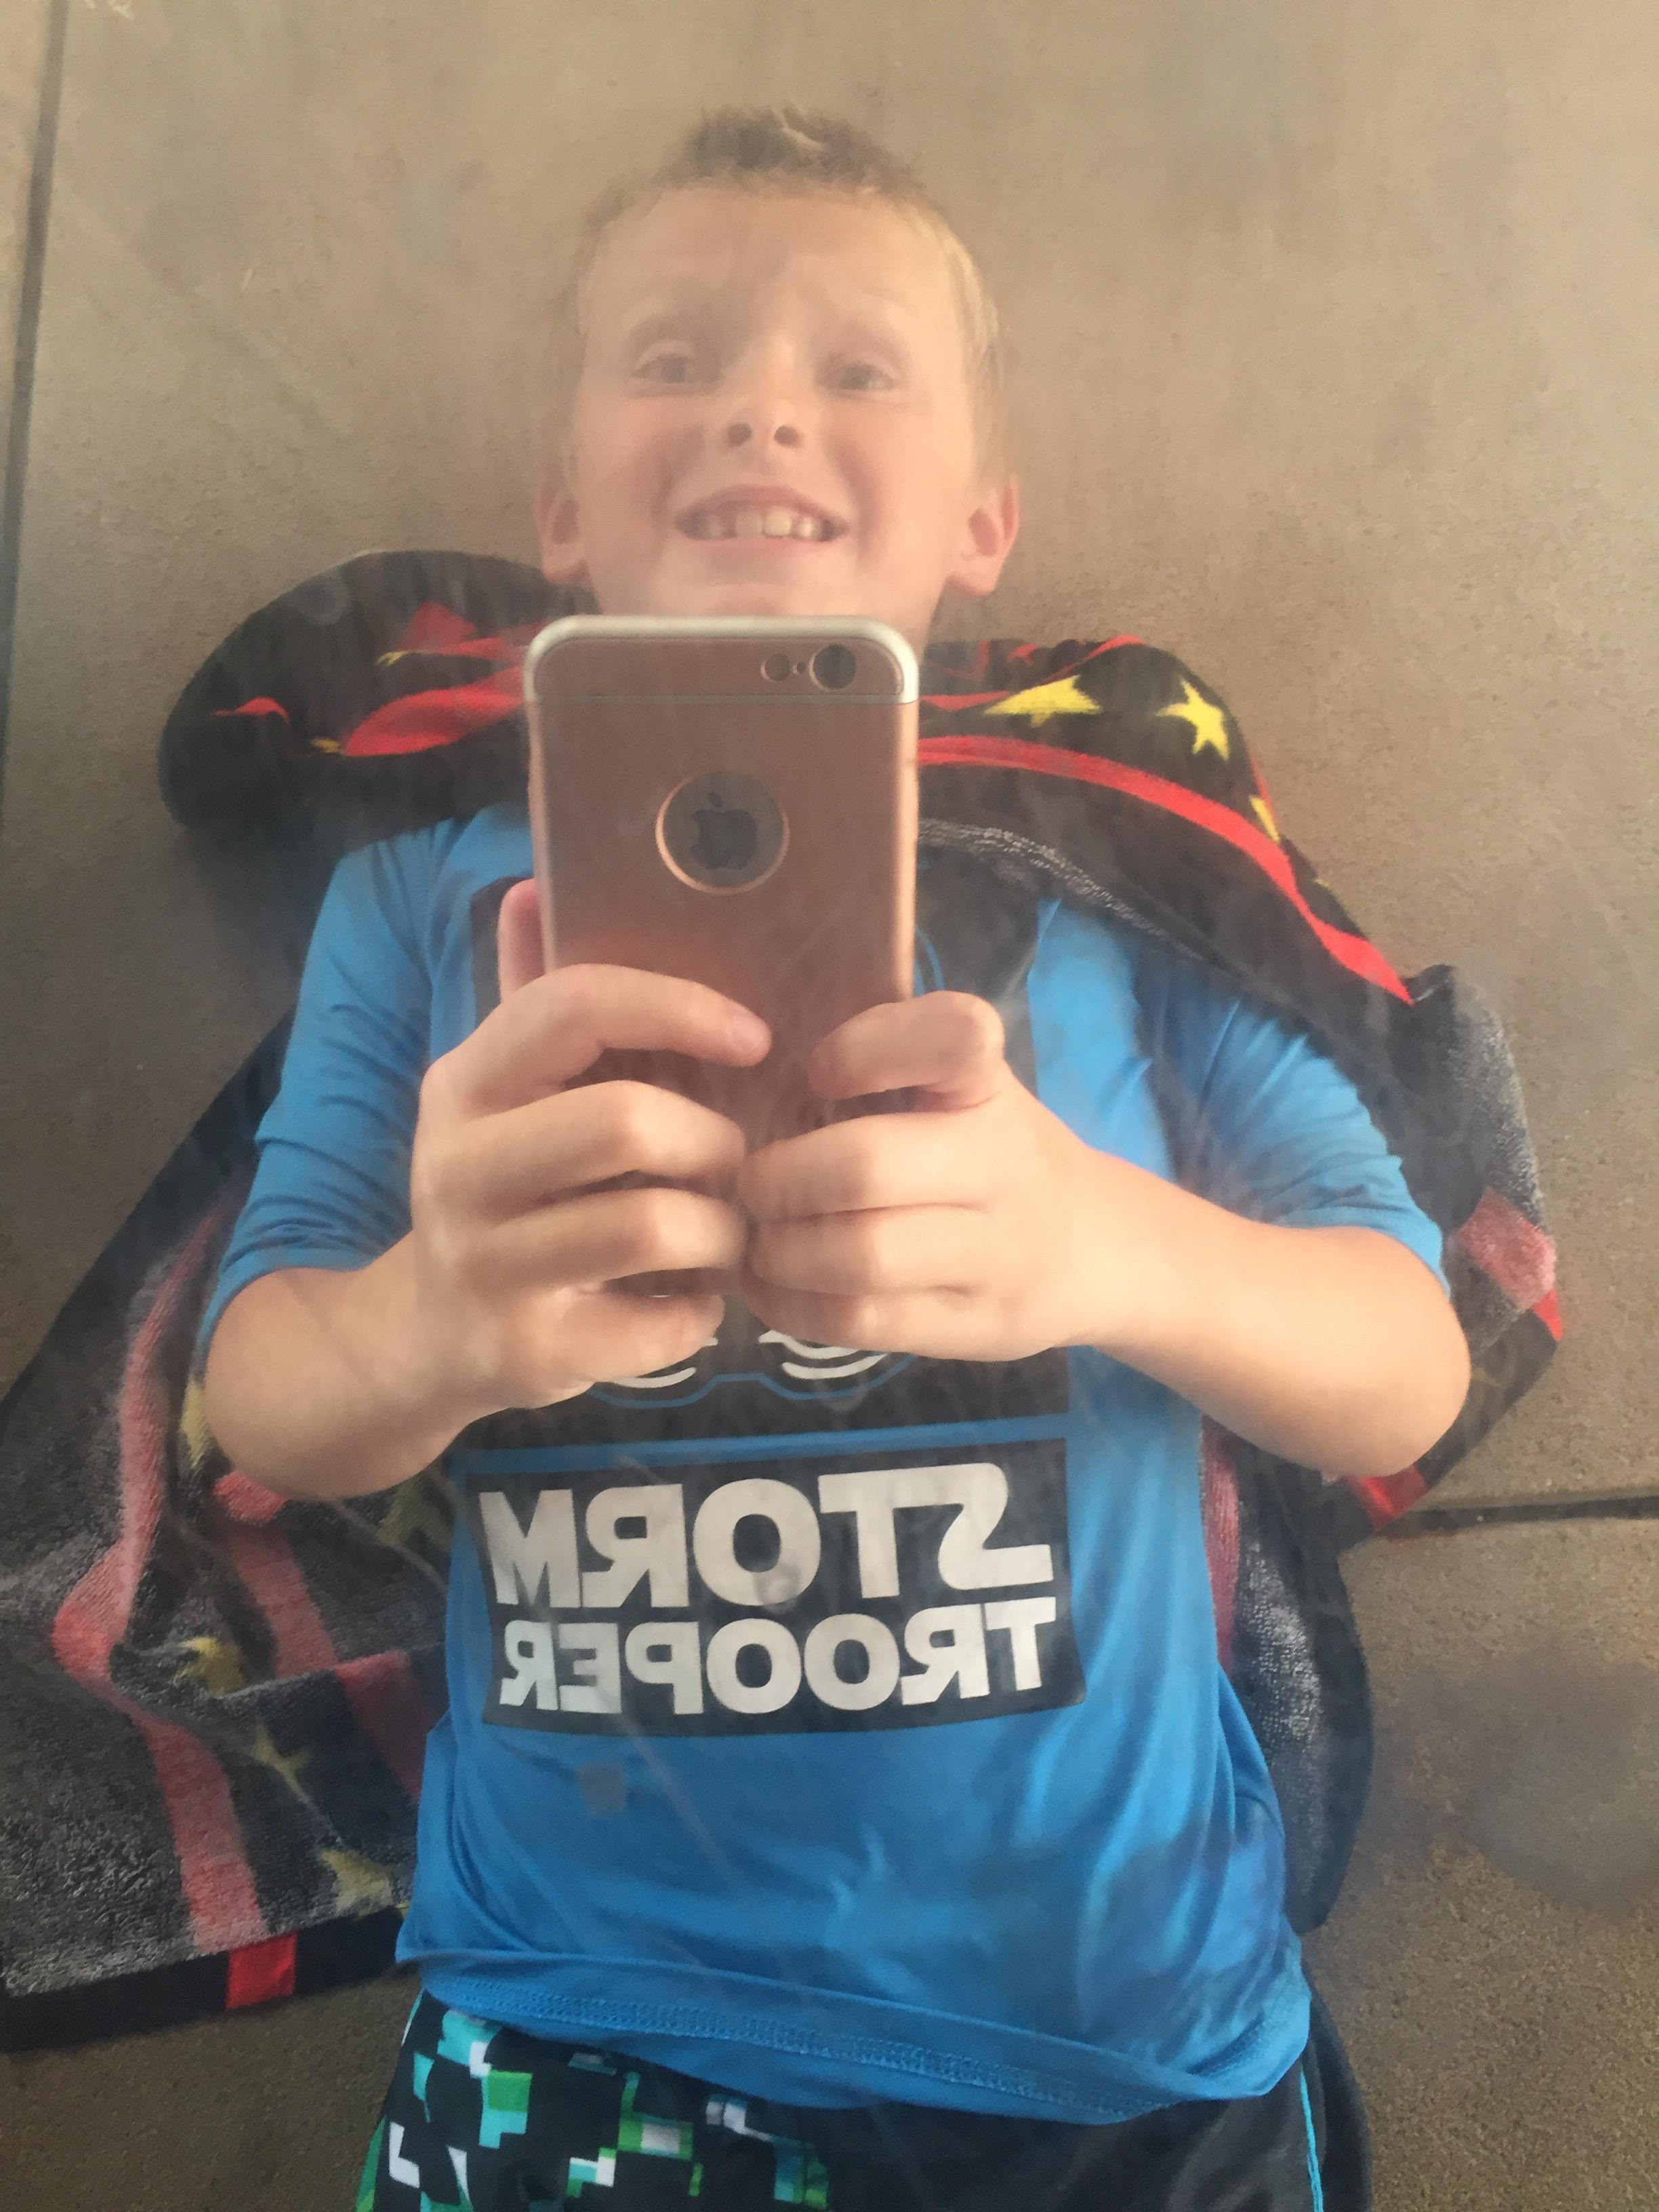 selfie, funny boy, the bean, cloudgate, chicago, chicago blogger, mommy blog, mom guilt